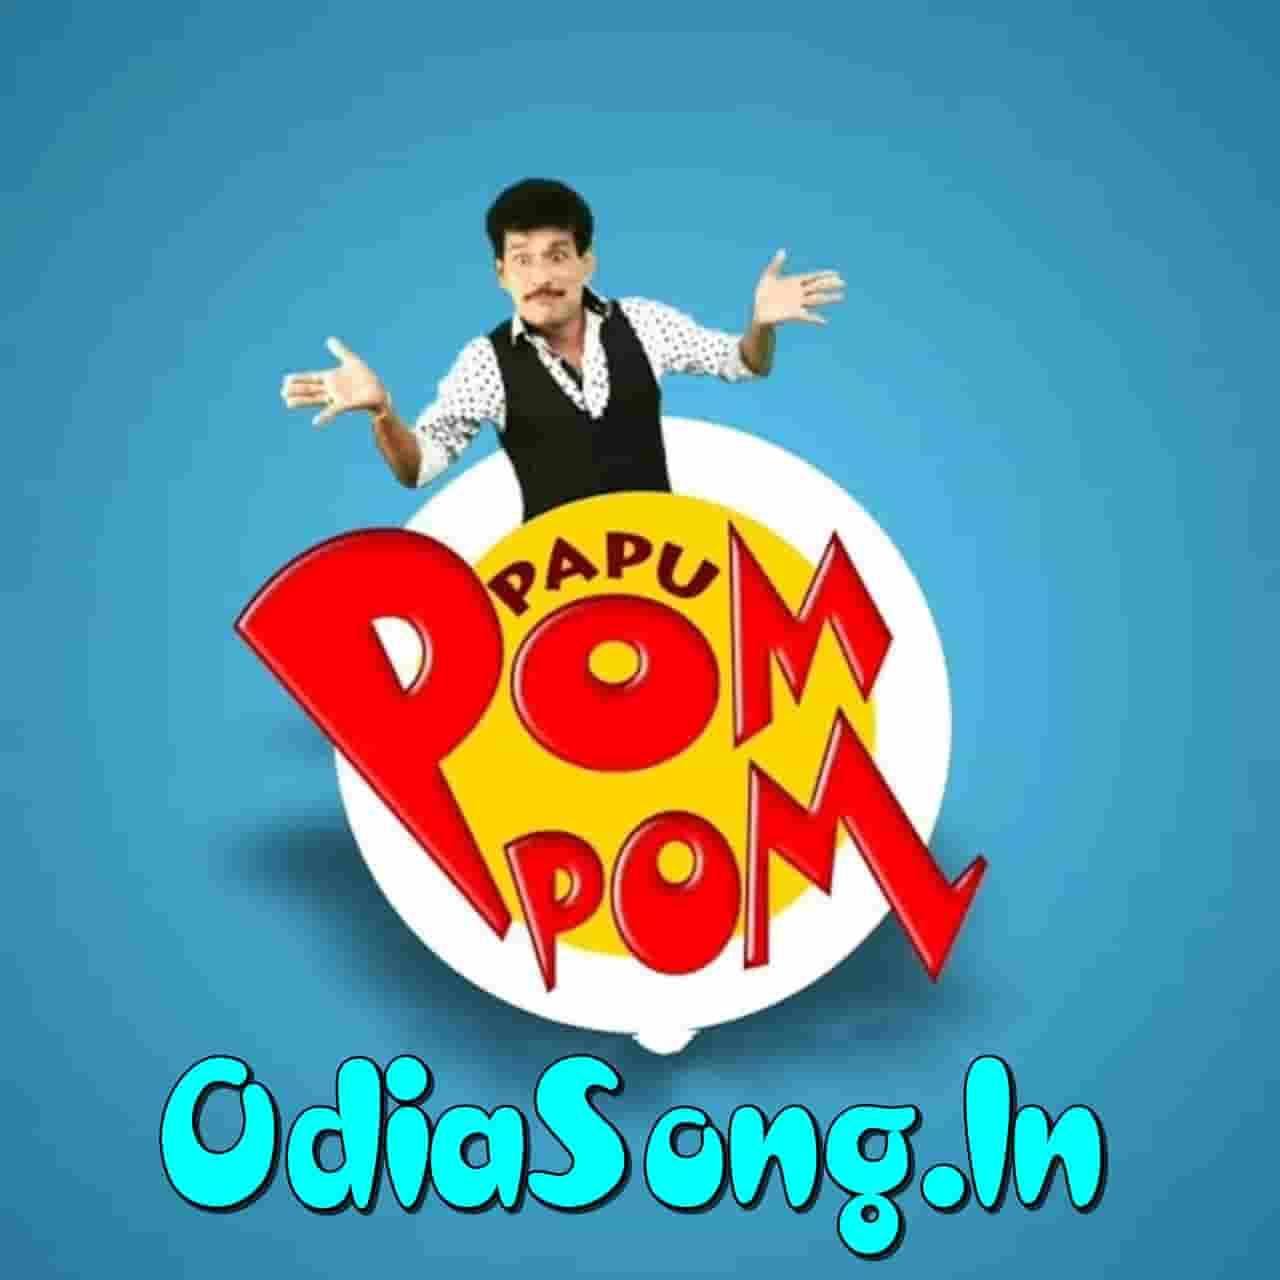 Mili Maila Diasili (Papu Pom Pom) Odia Funny Sad Song